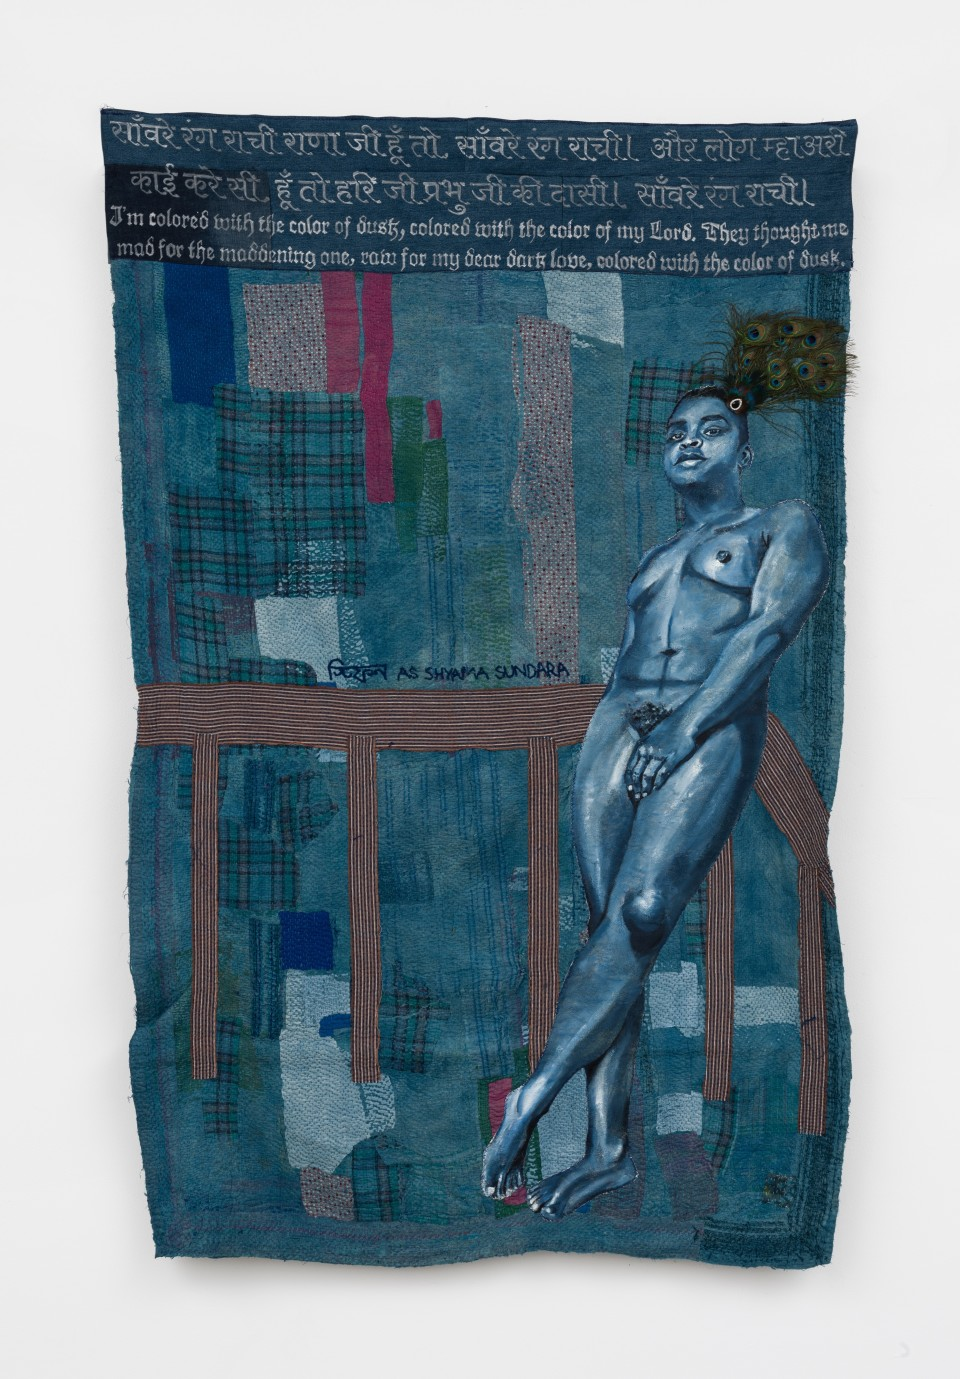 Image: Bhasha Chakrabarti  To be so Black and Blue (Chiffon as Shyama Sundara), 2021 used clothing, thread, oil, indigofera guatamalensis, peacock feathers, and song by Mira-bai  84 x 52 inches  (BCh.21.001.84)